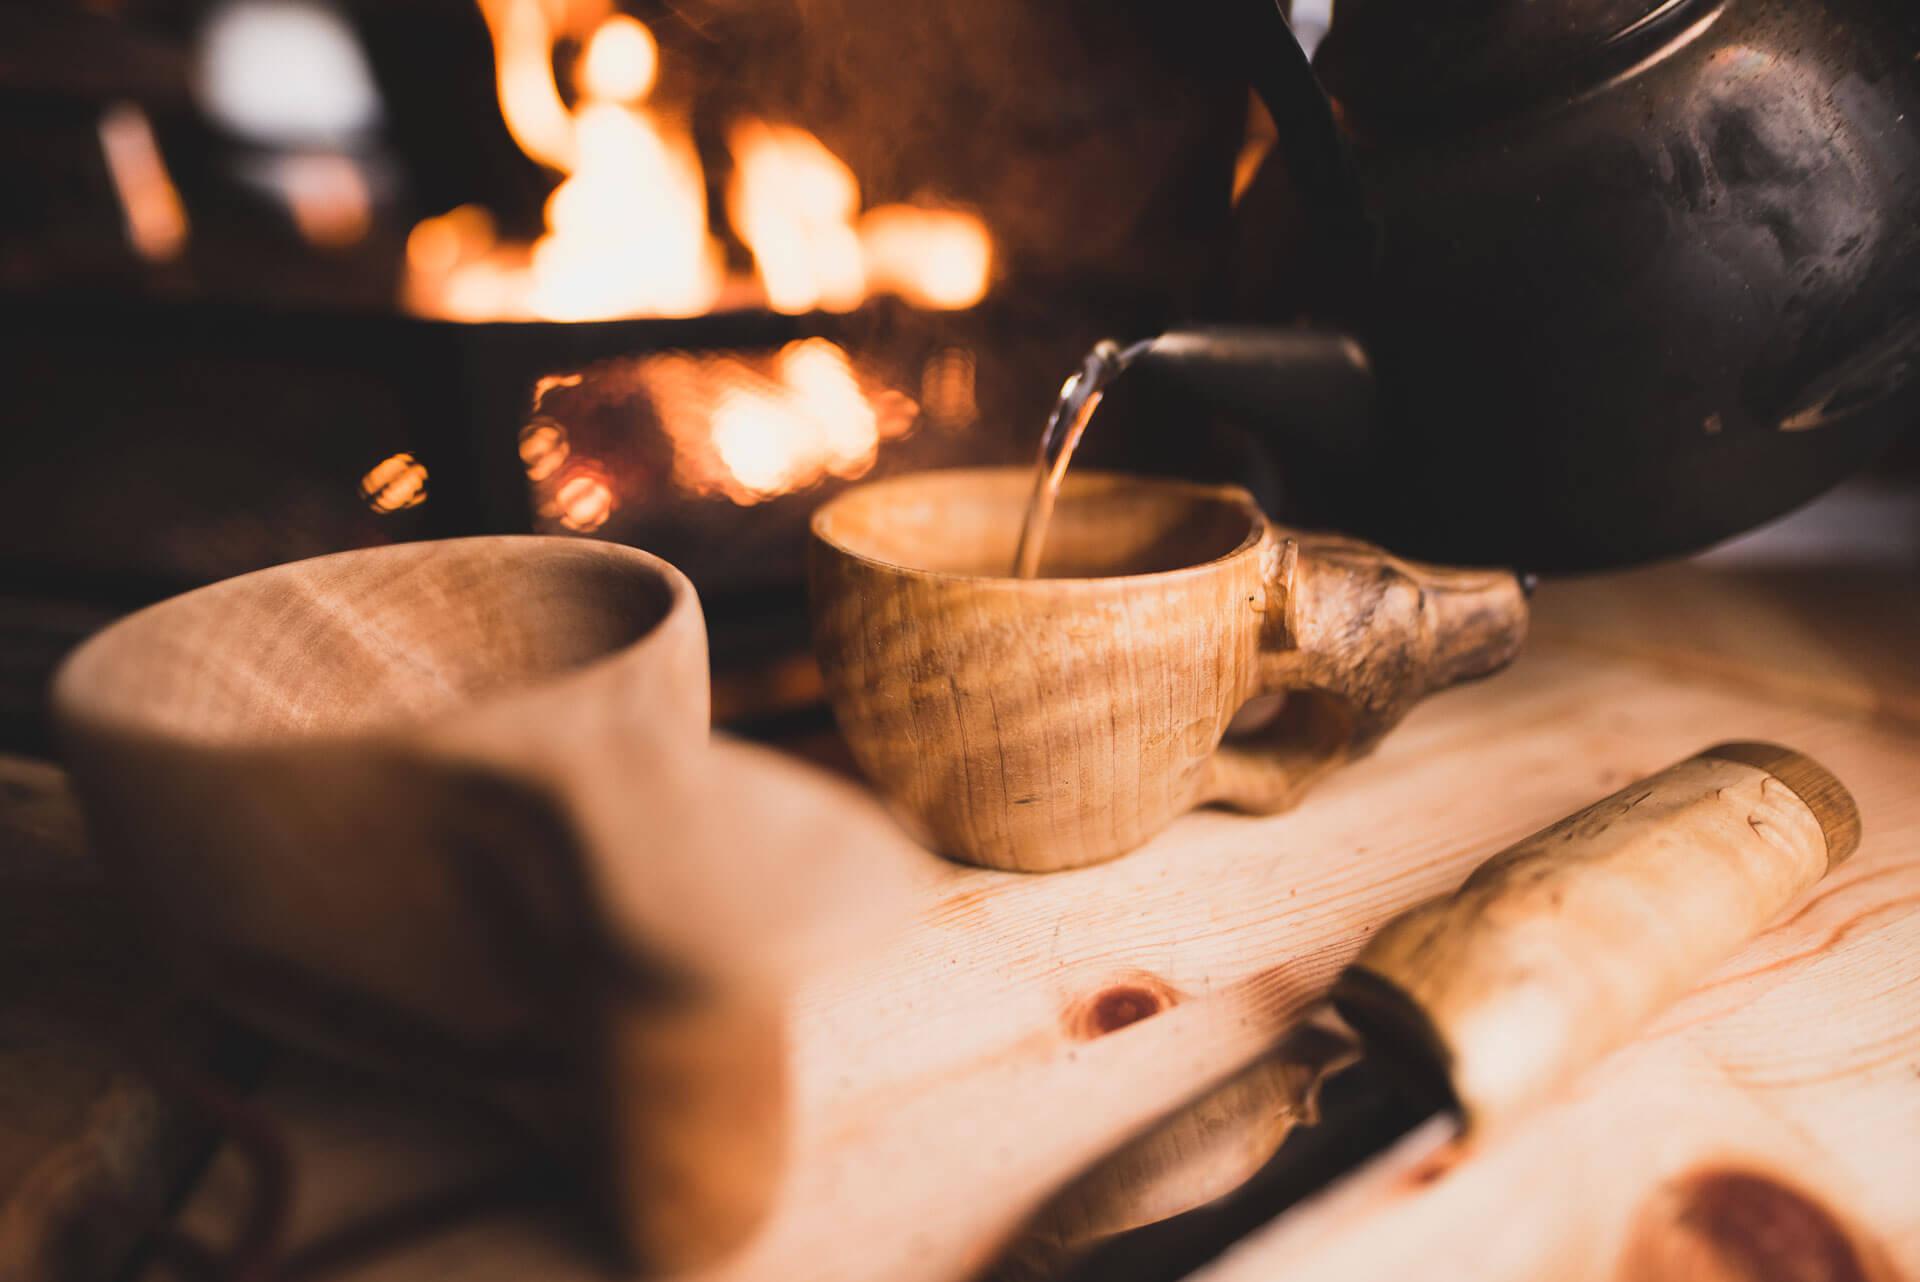 Kuksa cup & Finnish knife